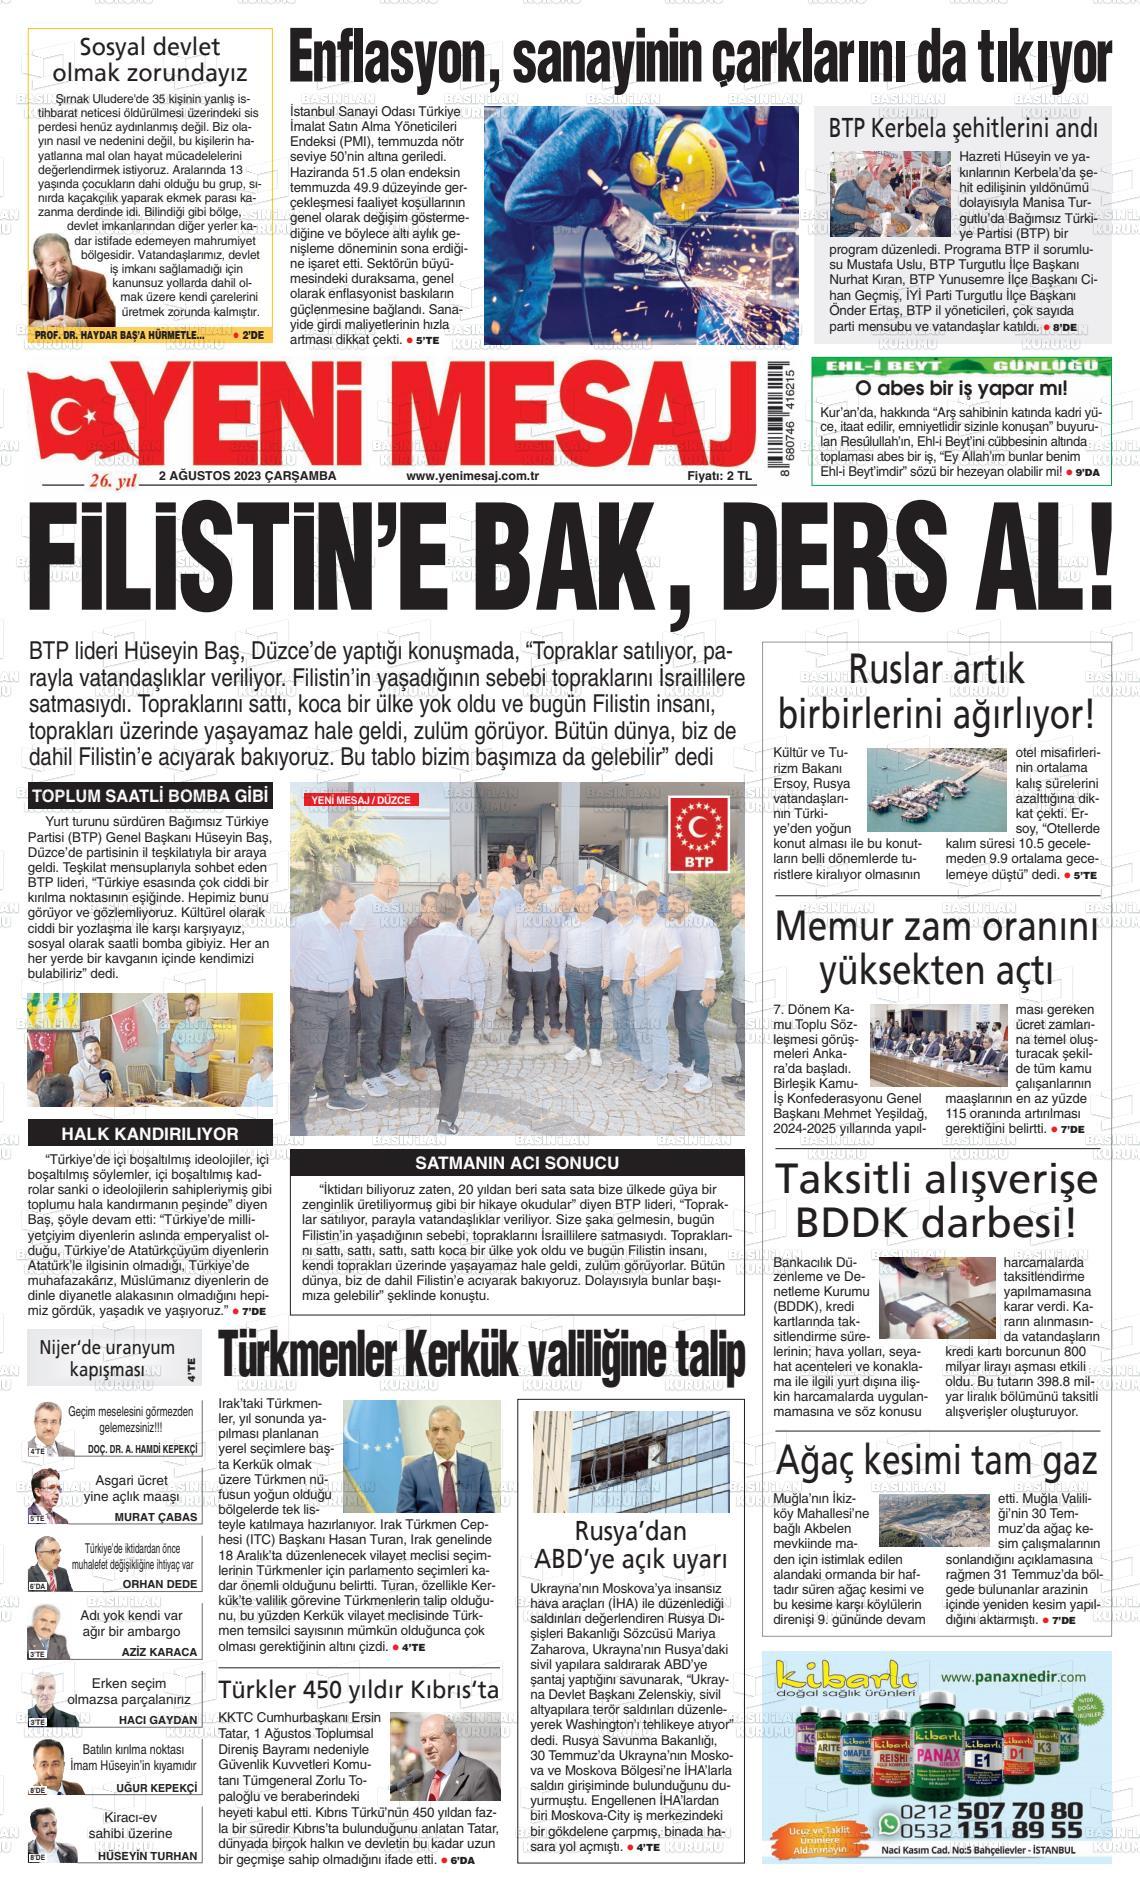 Yeni Mesaj Gazetesi